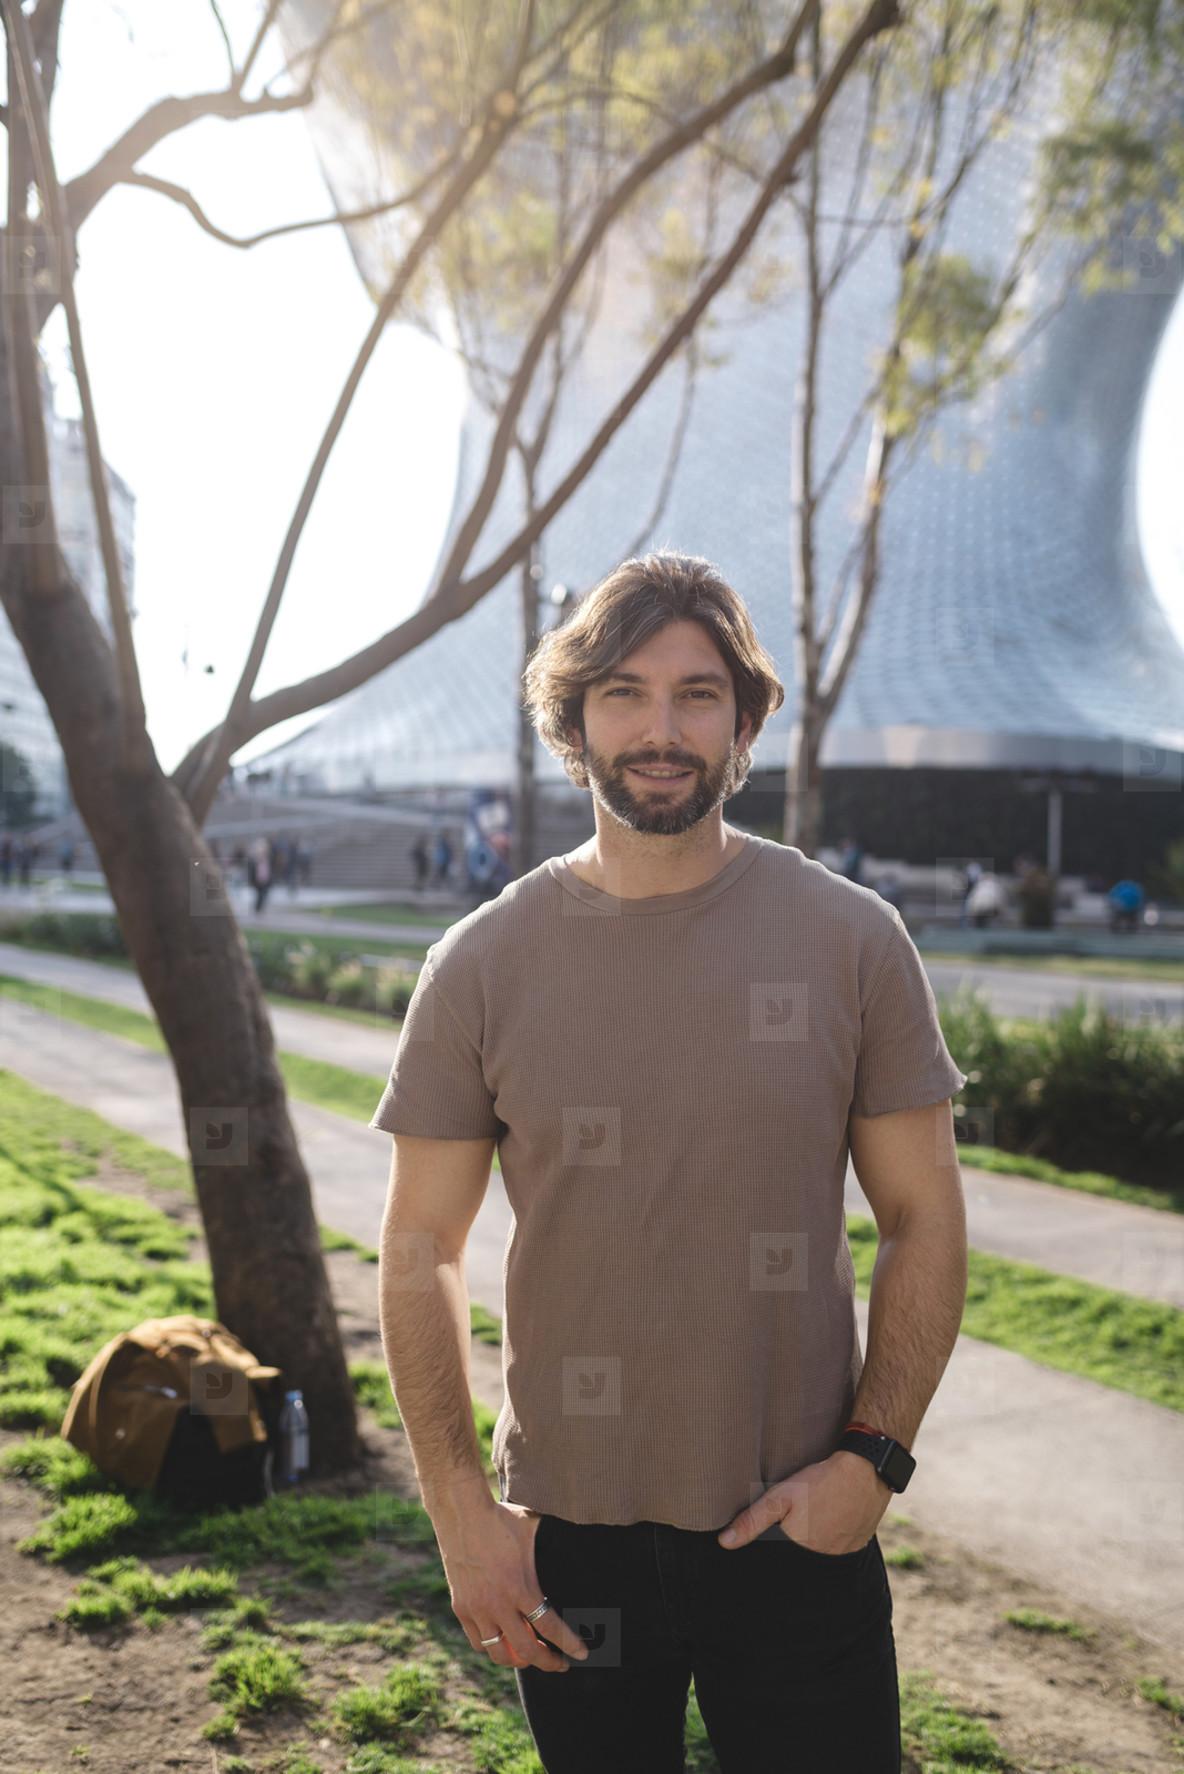 Modern bearded man posing on street